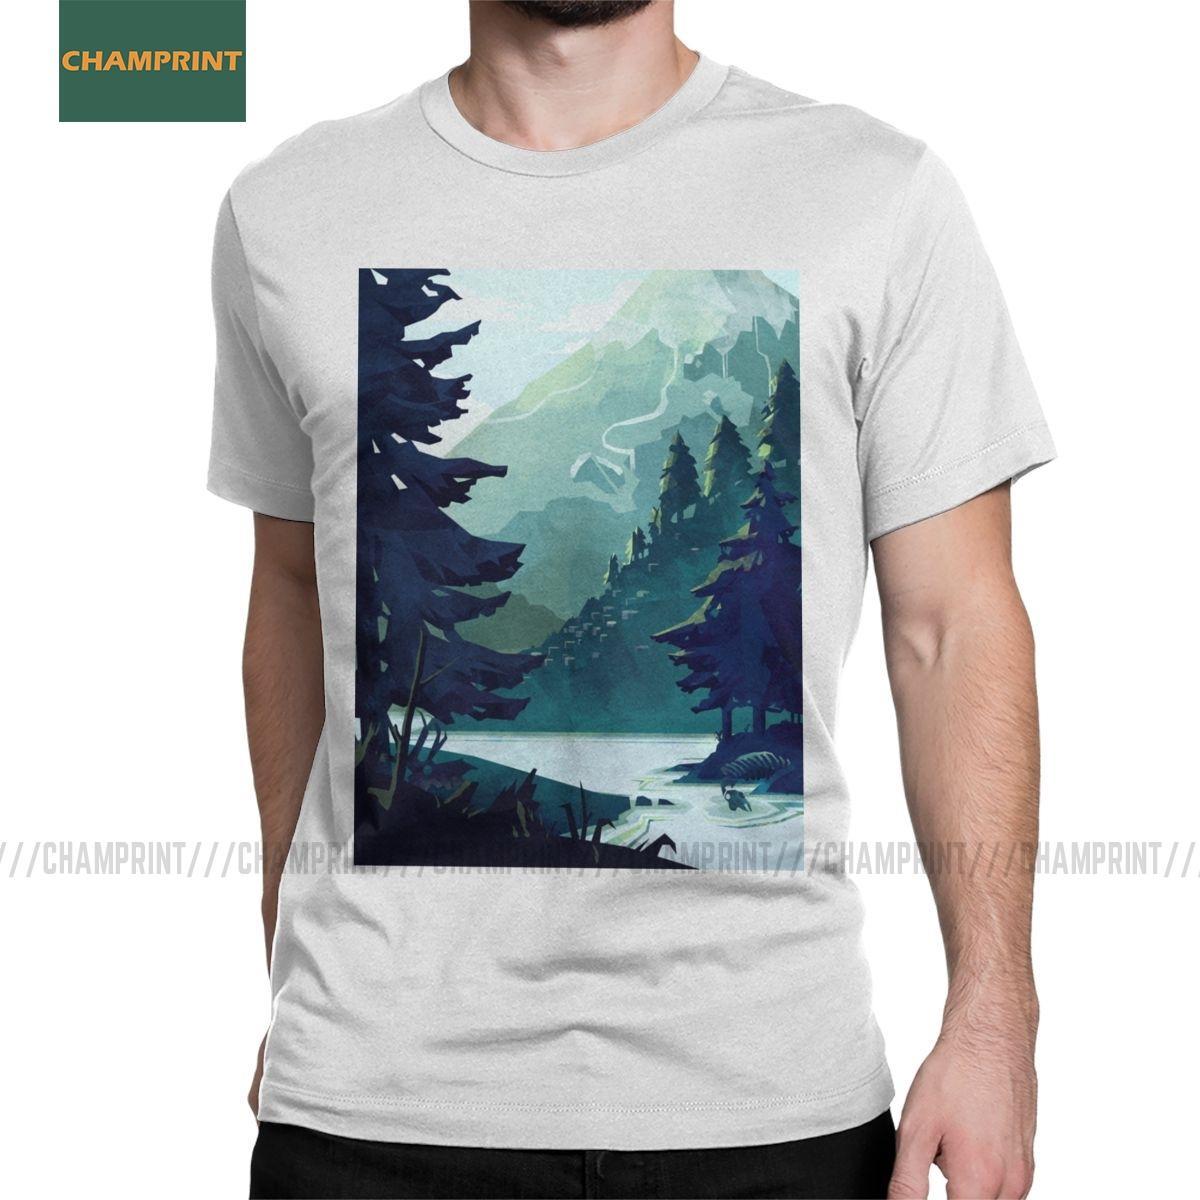 Männer T-Shirts Canadian Mountain Wild Life Kühle Baumwolle Tees Short Sleeve Erde Save Planet Bäume Reise Wald Shirts in Übergrößen